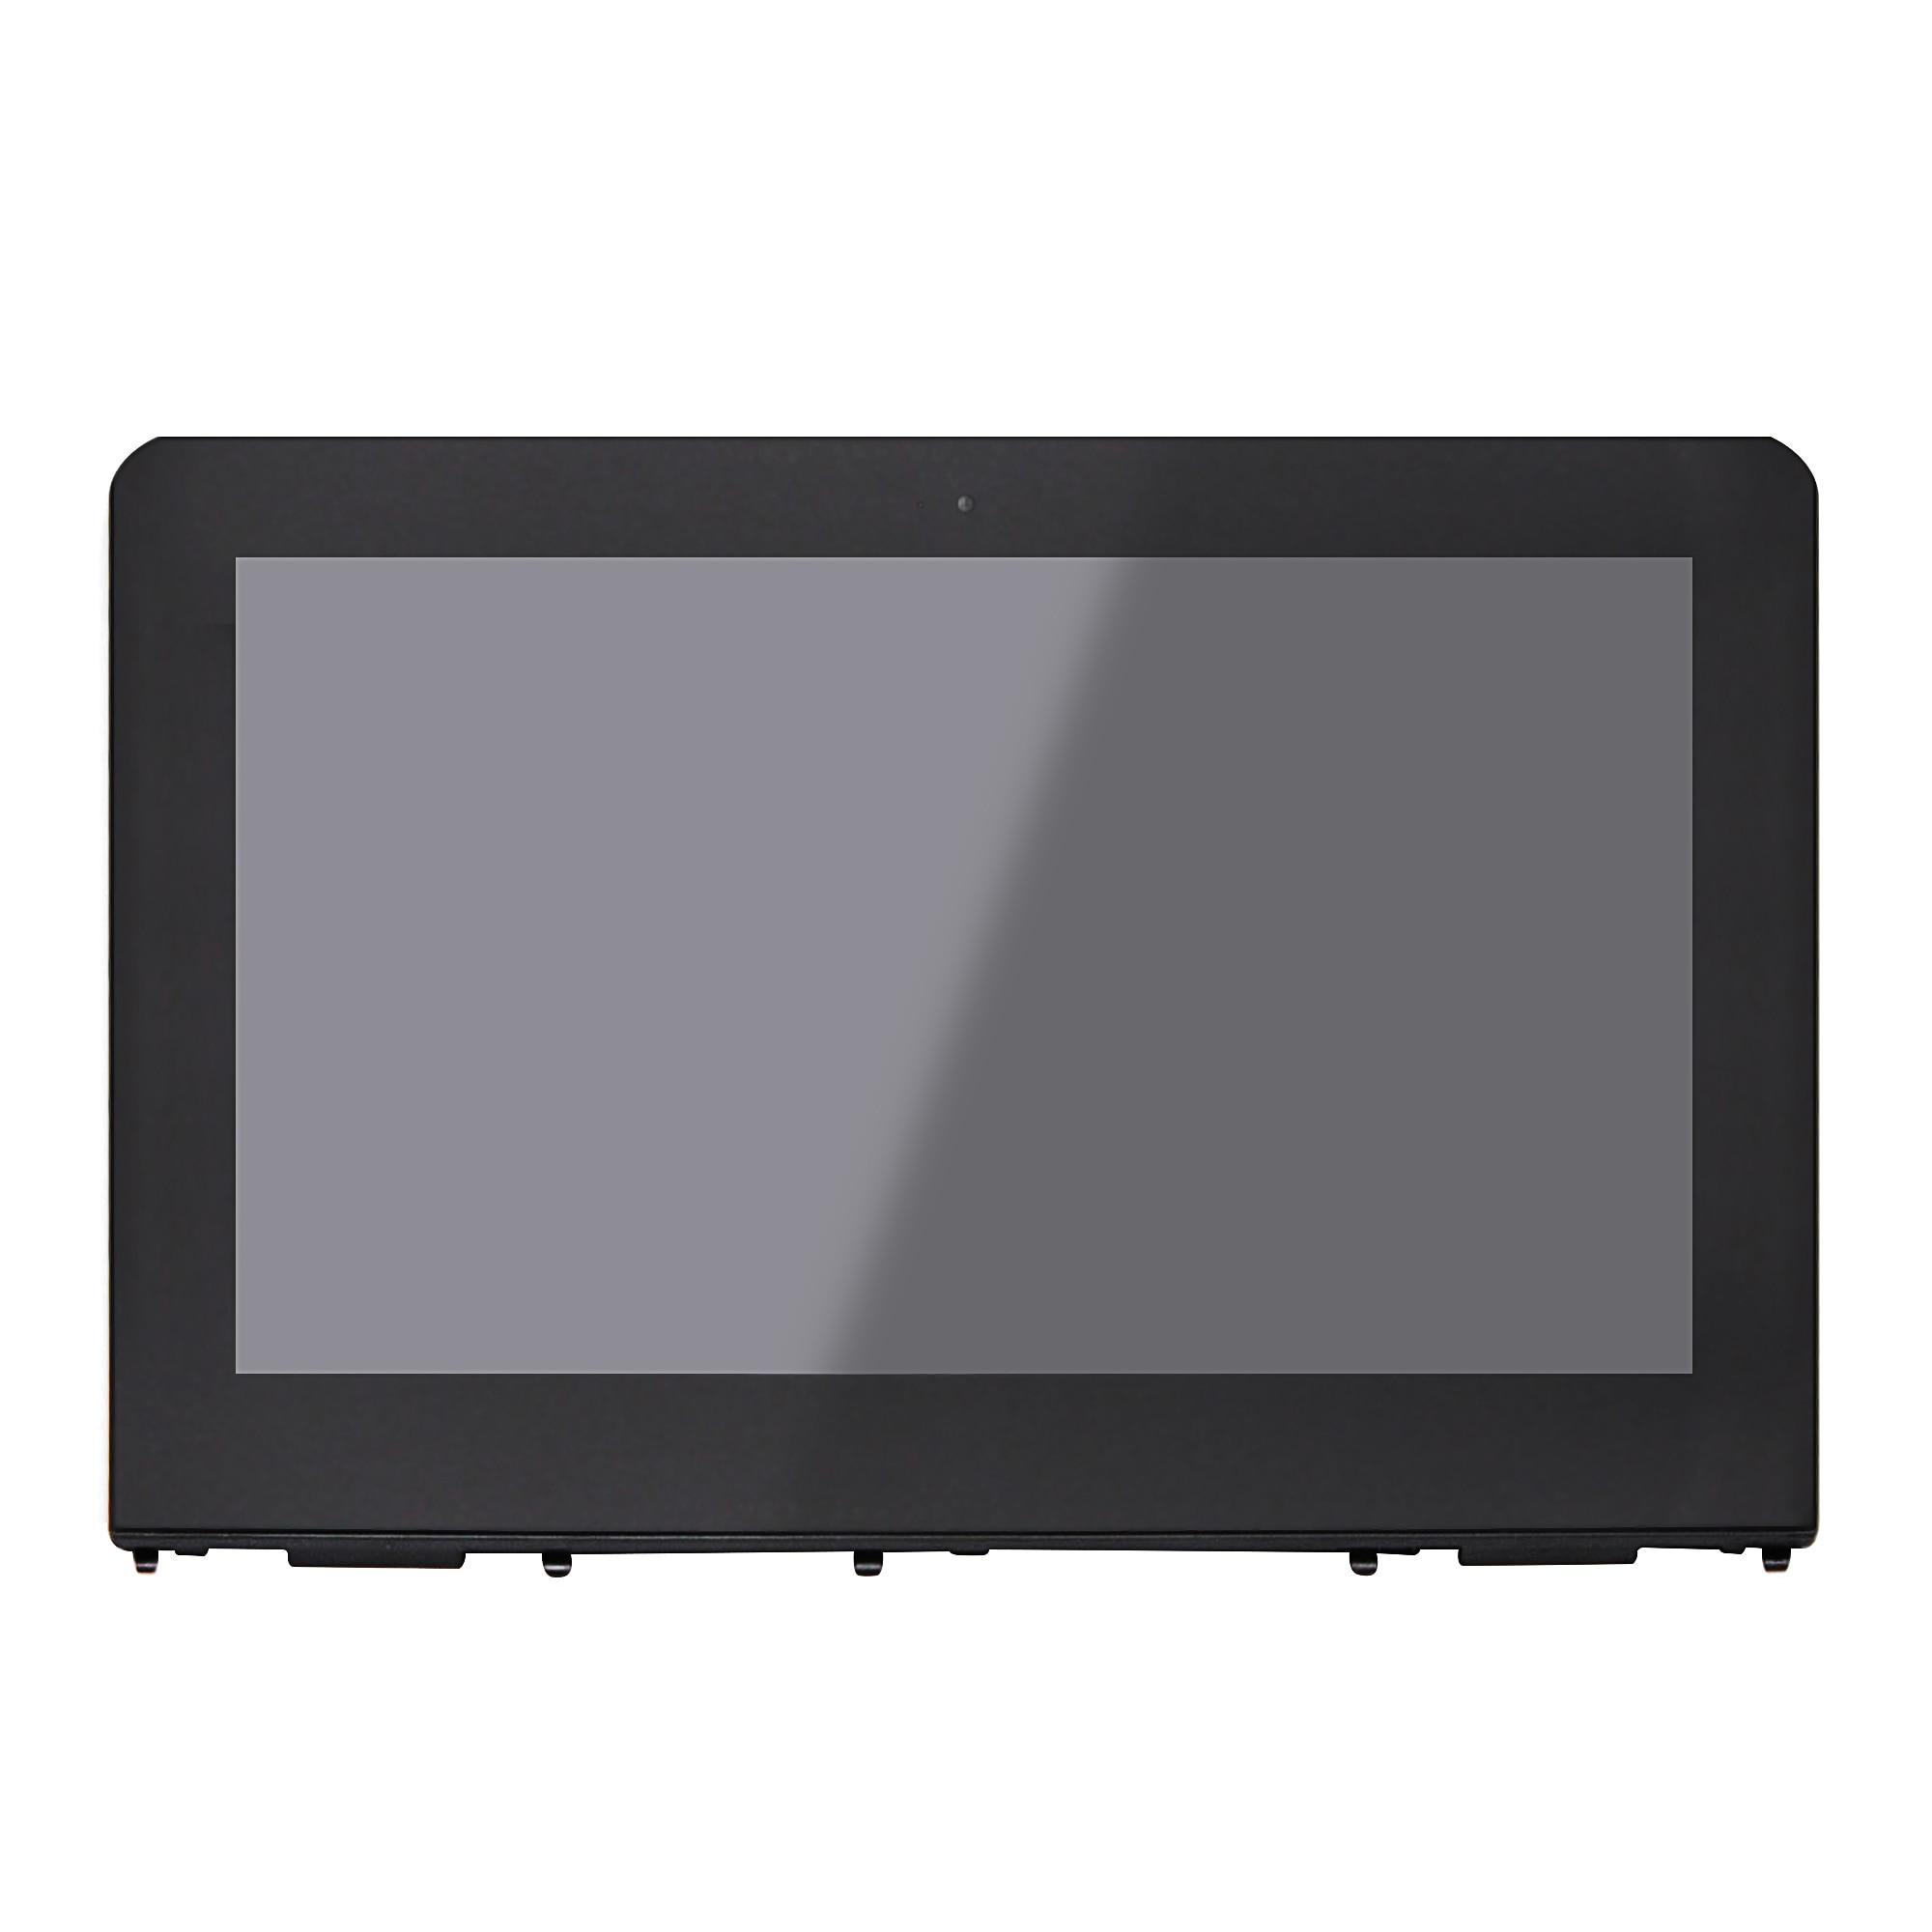 Сенсорный экран дигитайзер LCD сборка для HP x360 11-ab005tu 11-ab031tu 11-ab013la 11-ab042la 11-ab006tu 11-ab035tu 11-ab011dx